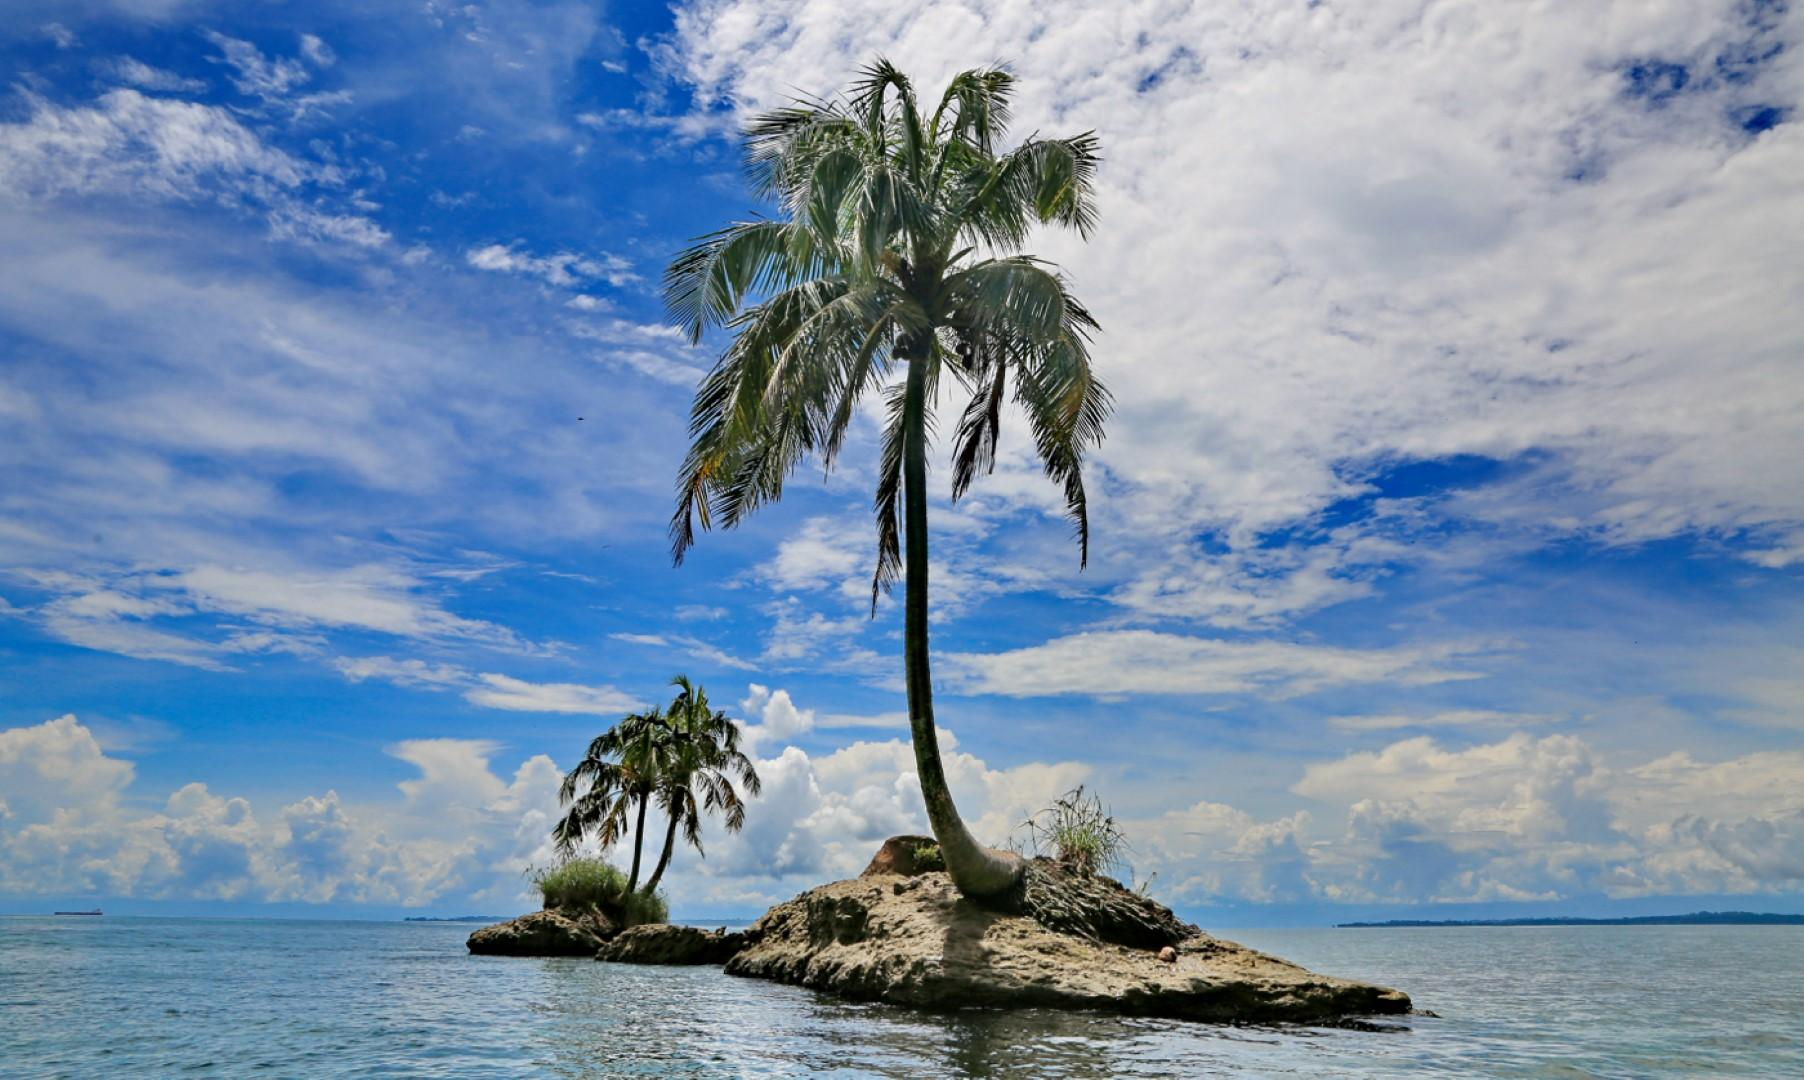 Donnavventura a Bocas del Toro, Panama